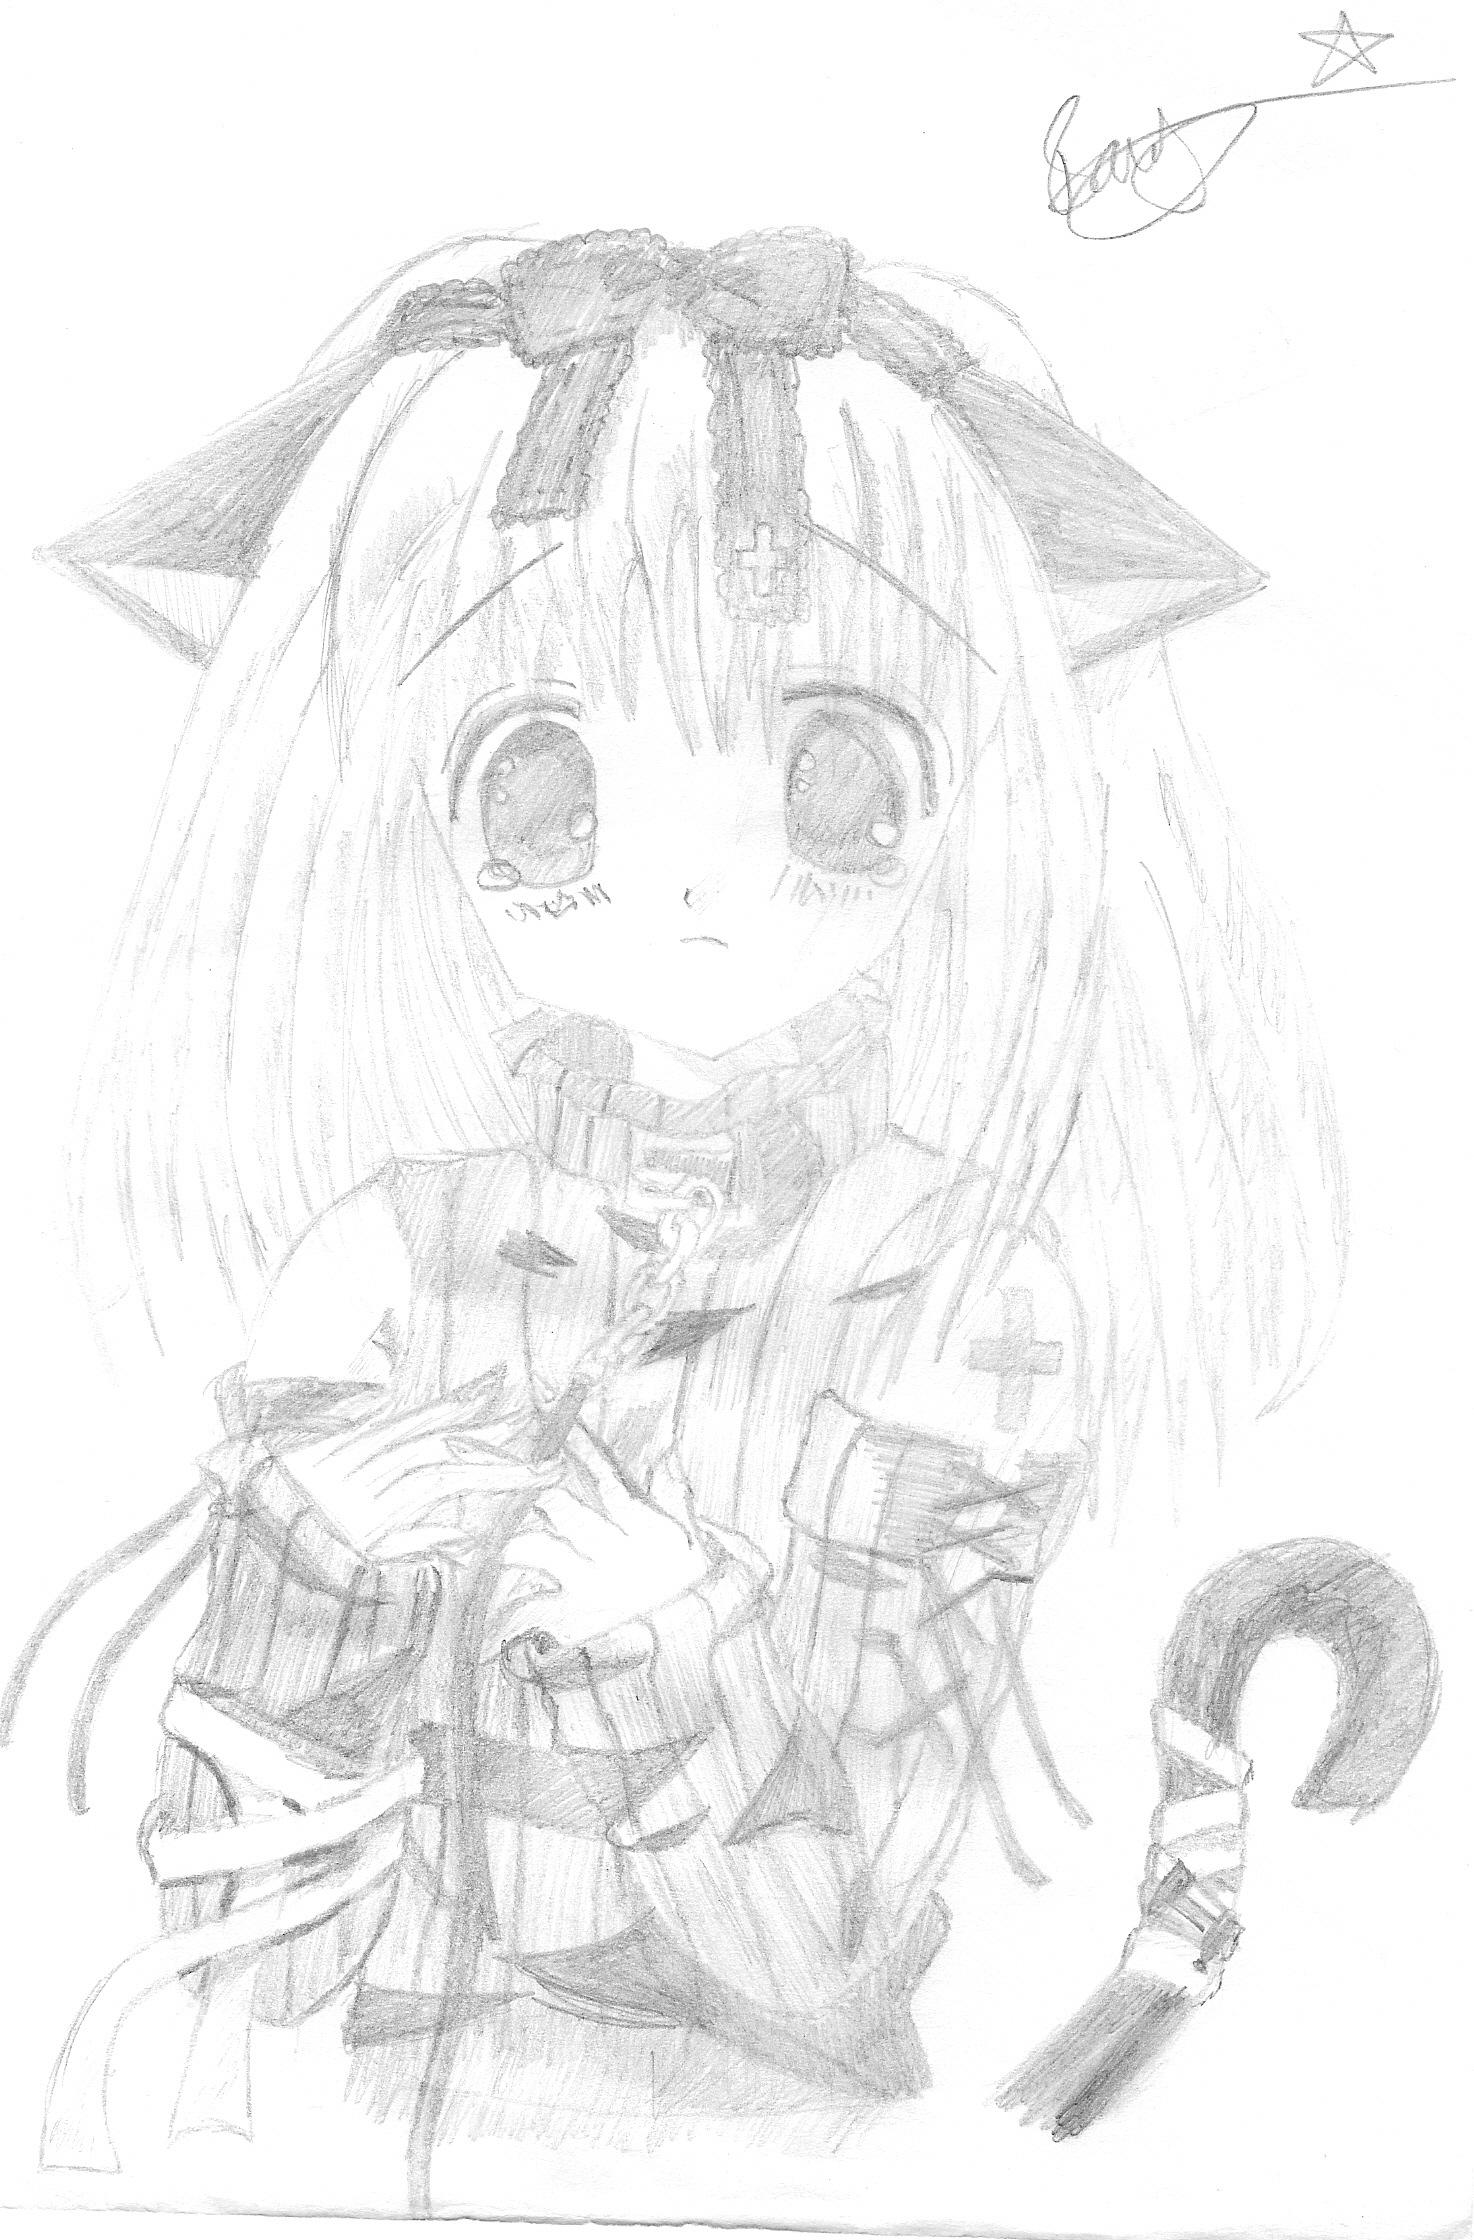 Drawn sad cute Cute Girl Looking Sad